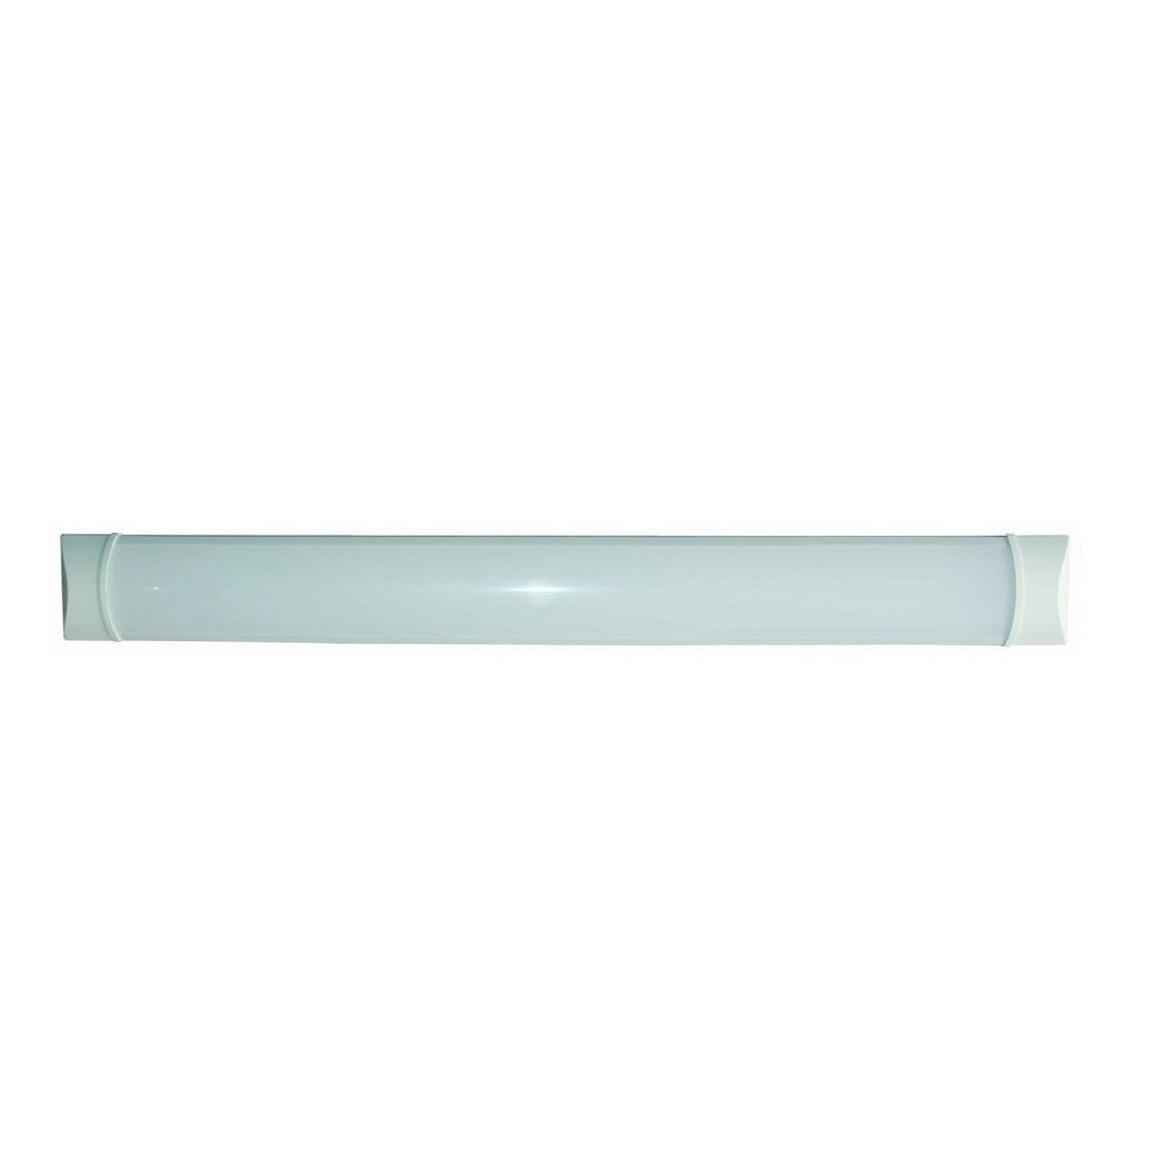 K2 GLOBAL KFL144 - 40 Watt 120 cm LED Yatay Bant Armatür